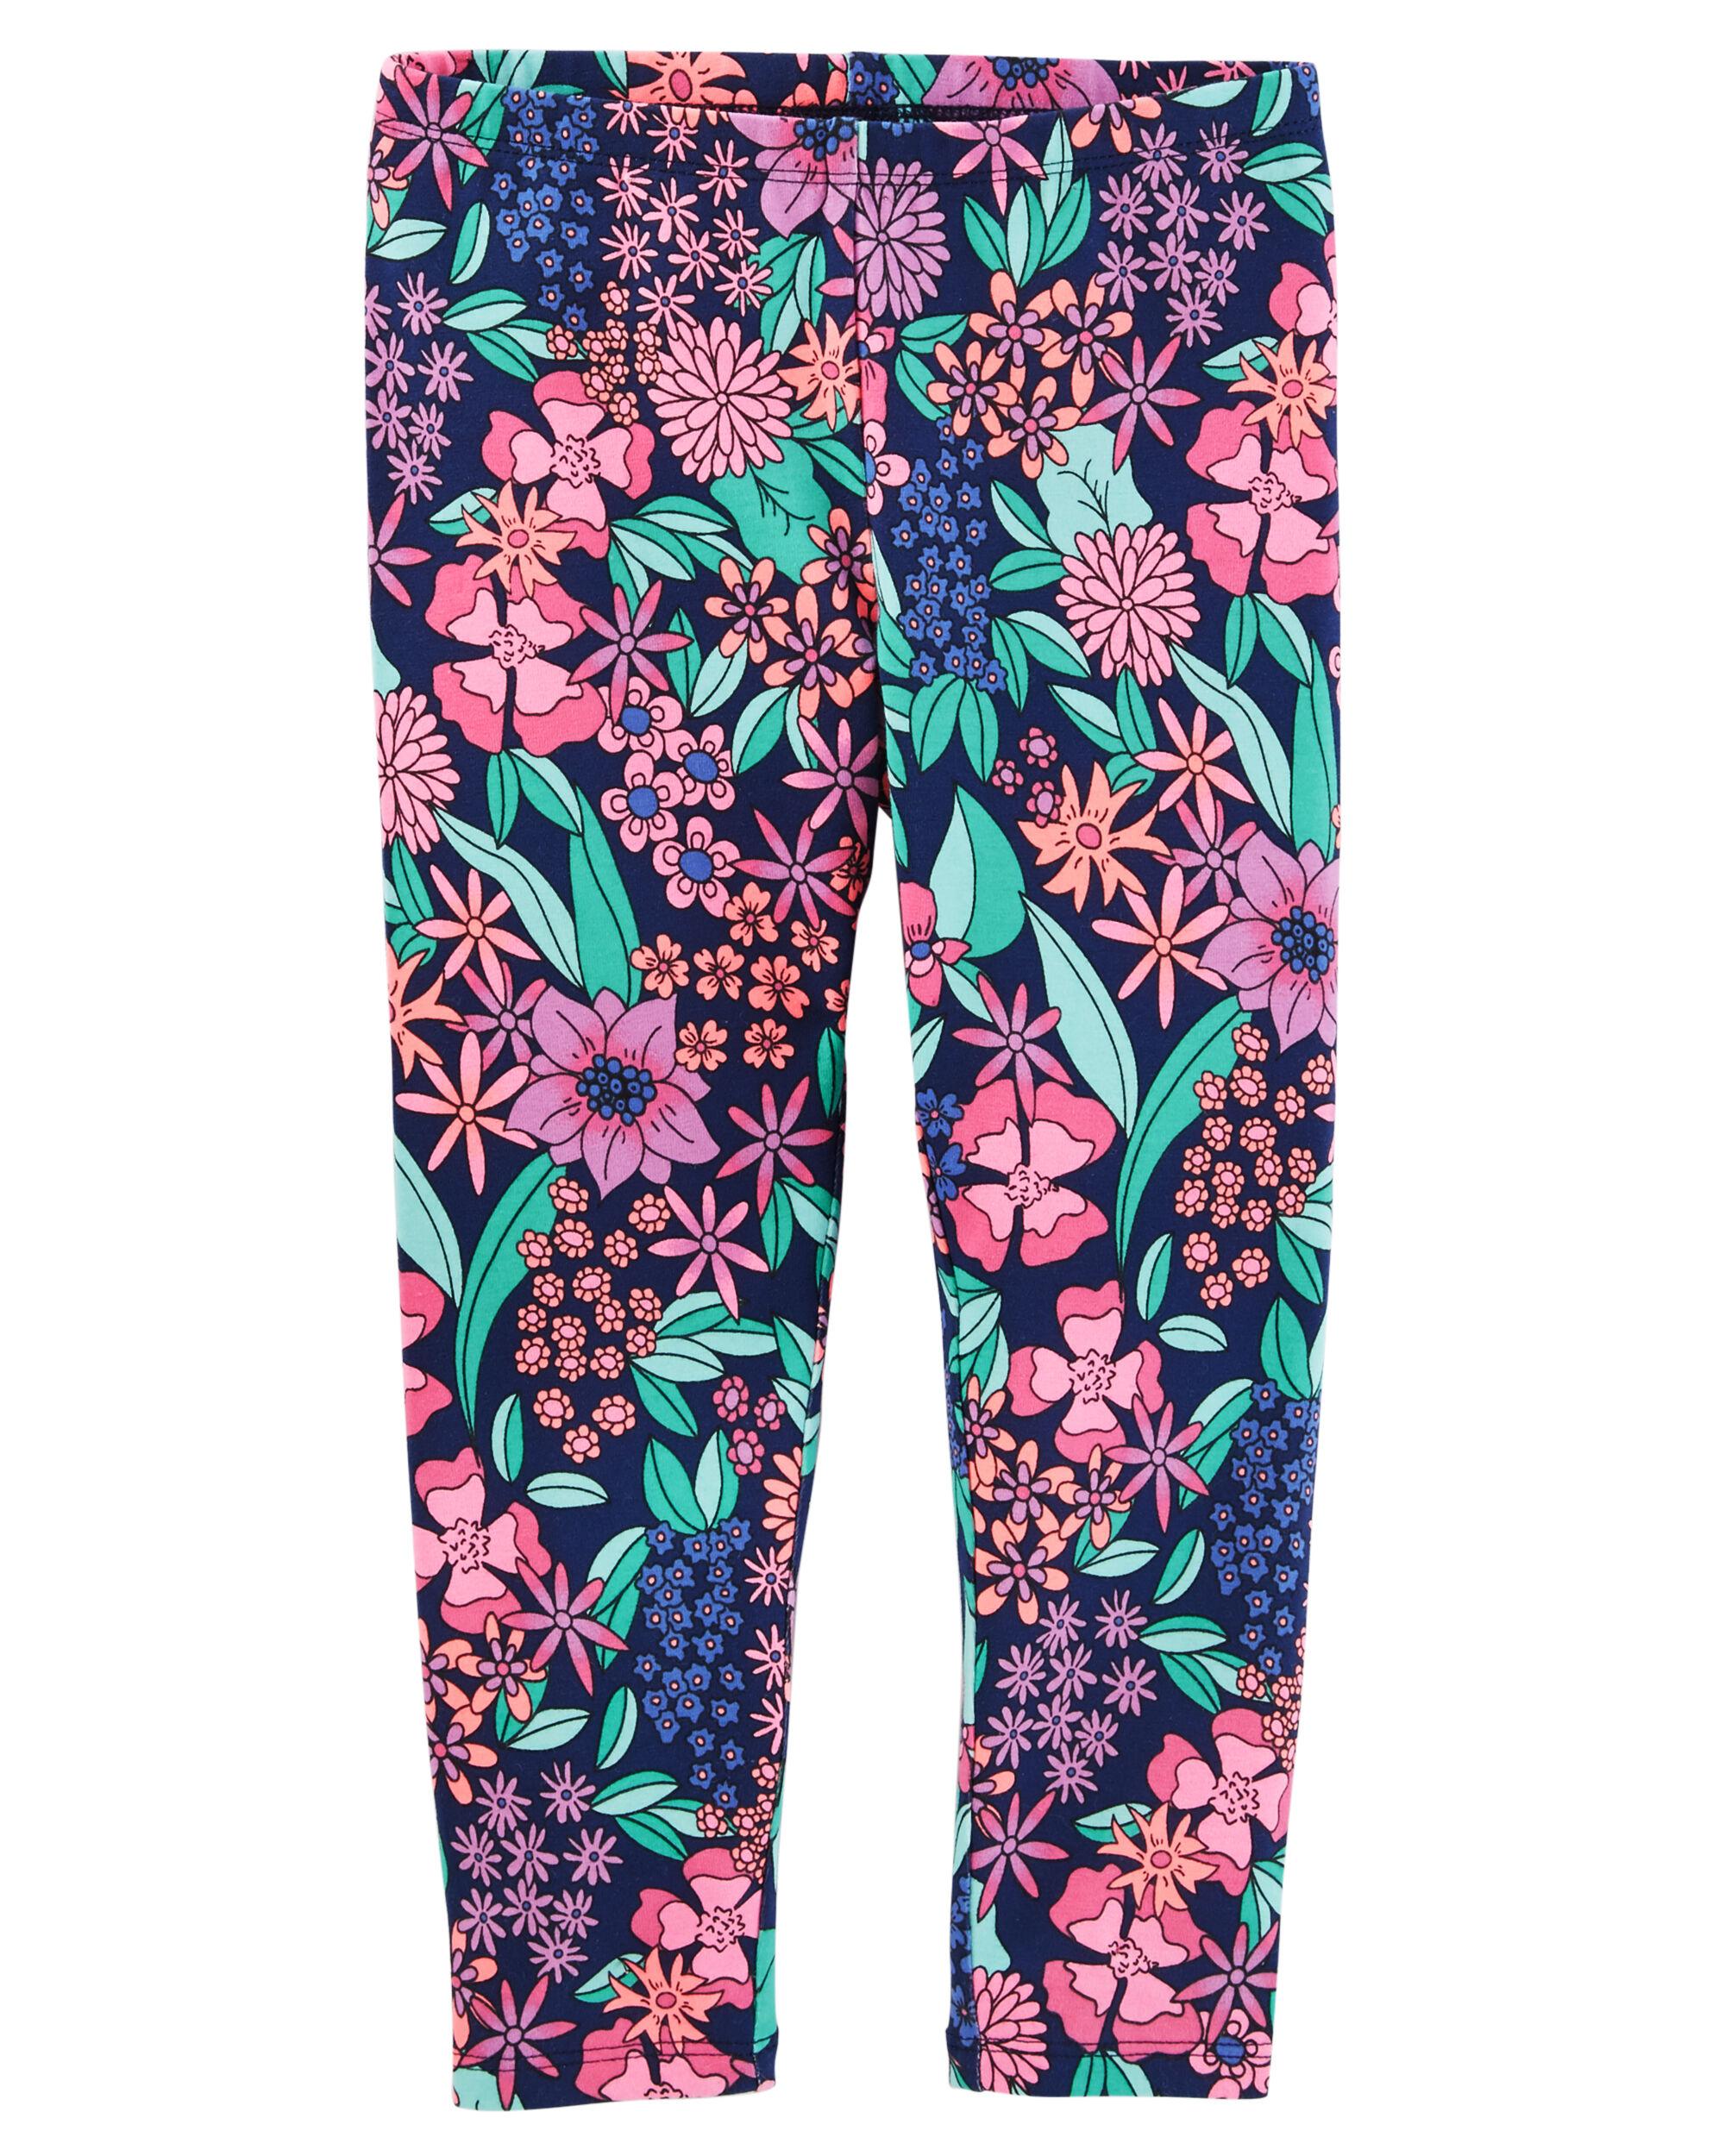 Mix Kit Floral Print Leggings